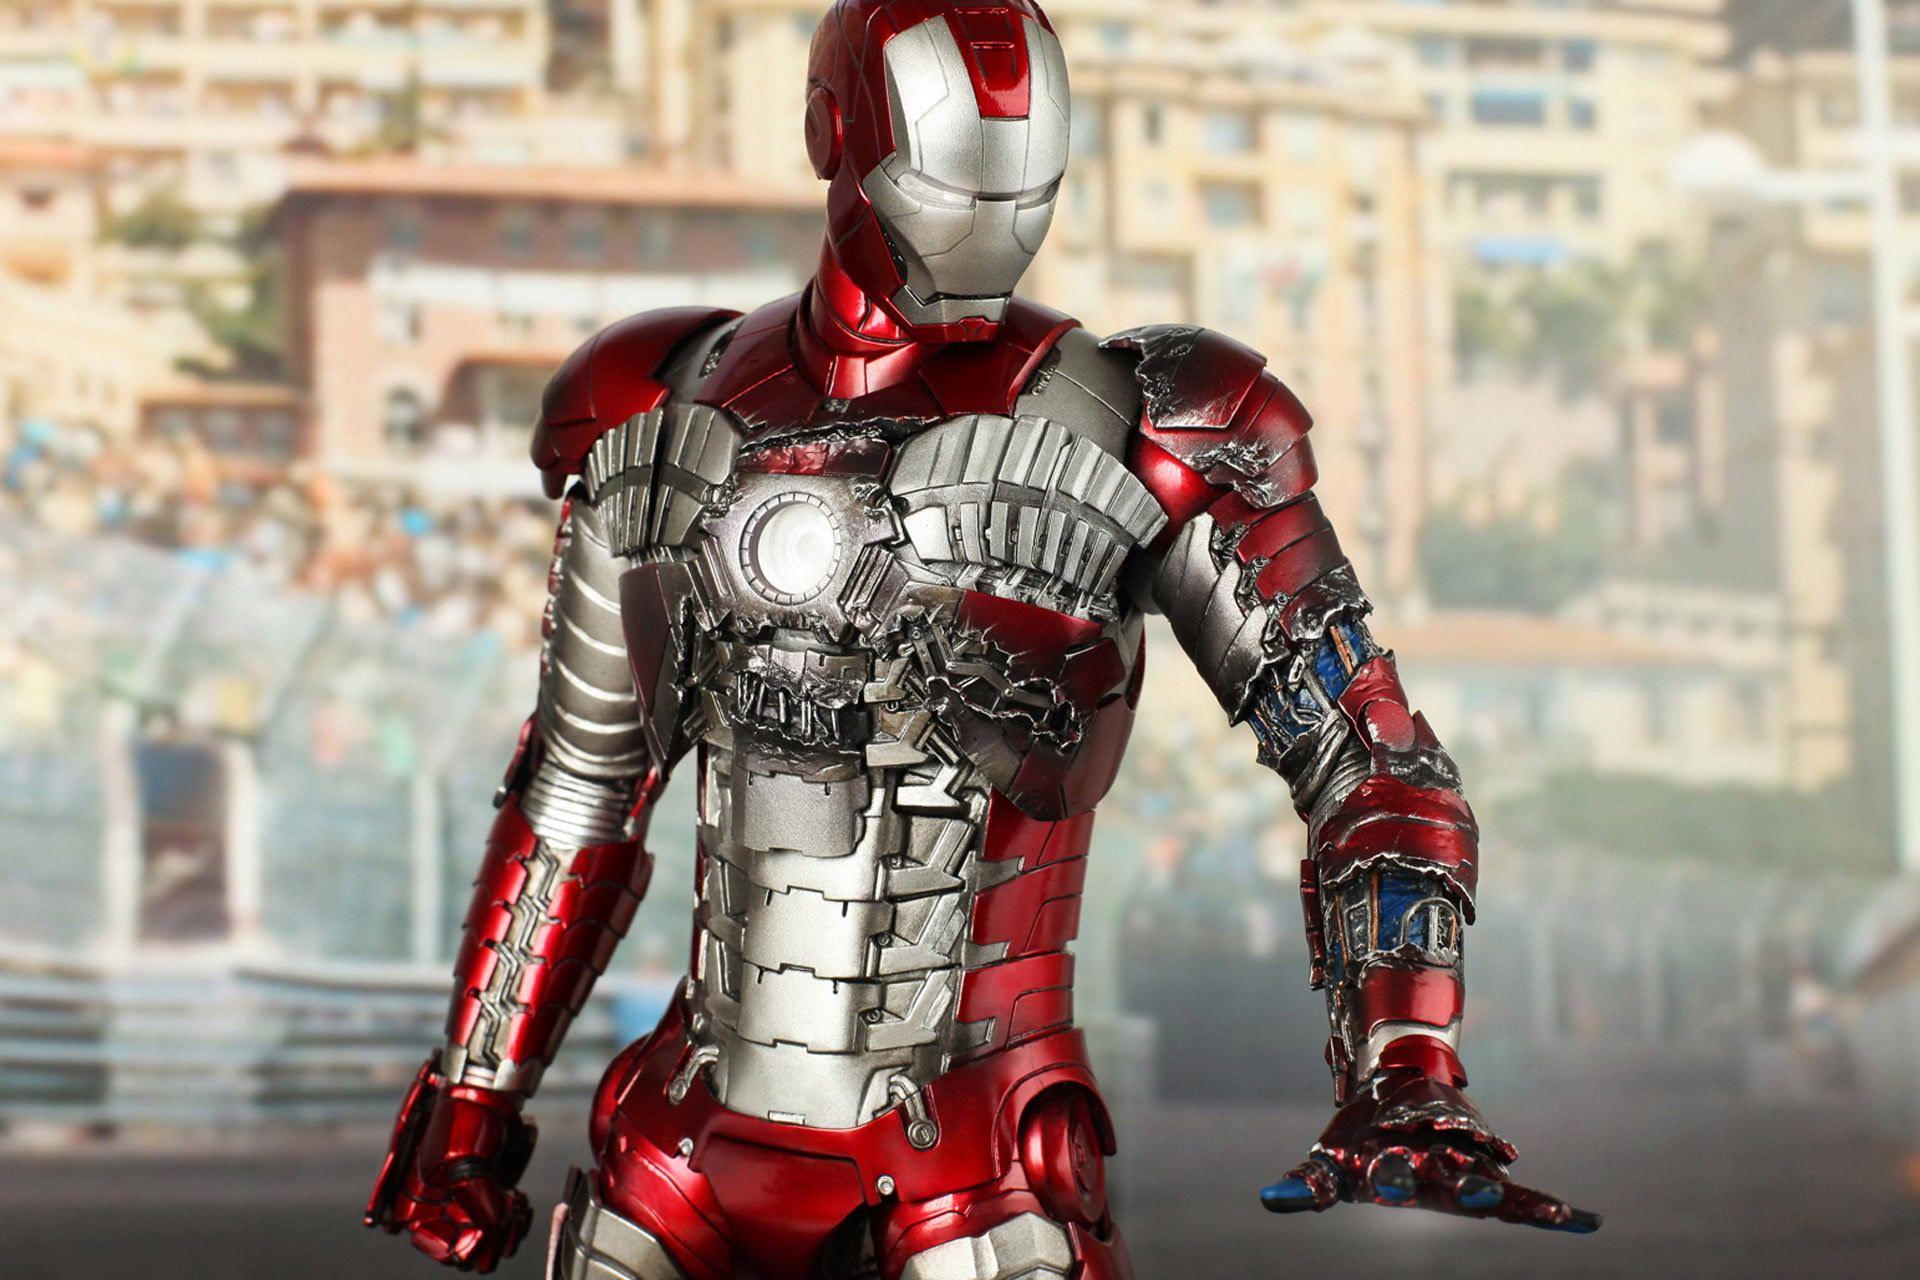 Iron Man Mark V Wallpaper - HD Wallpapers | Wallpapers ...  Iron Man Mark V...